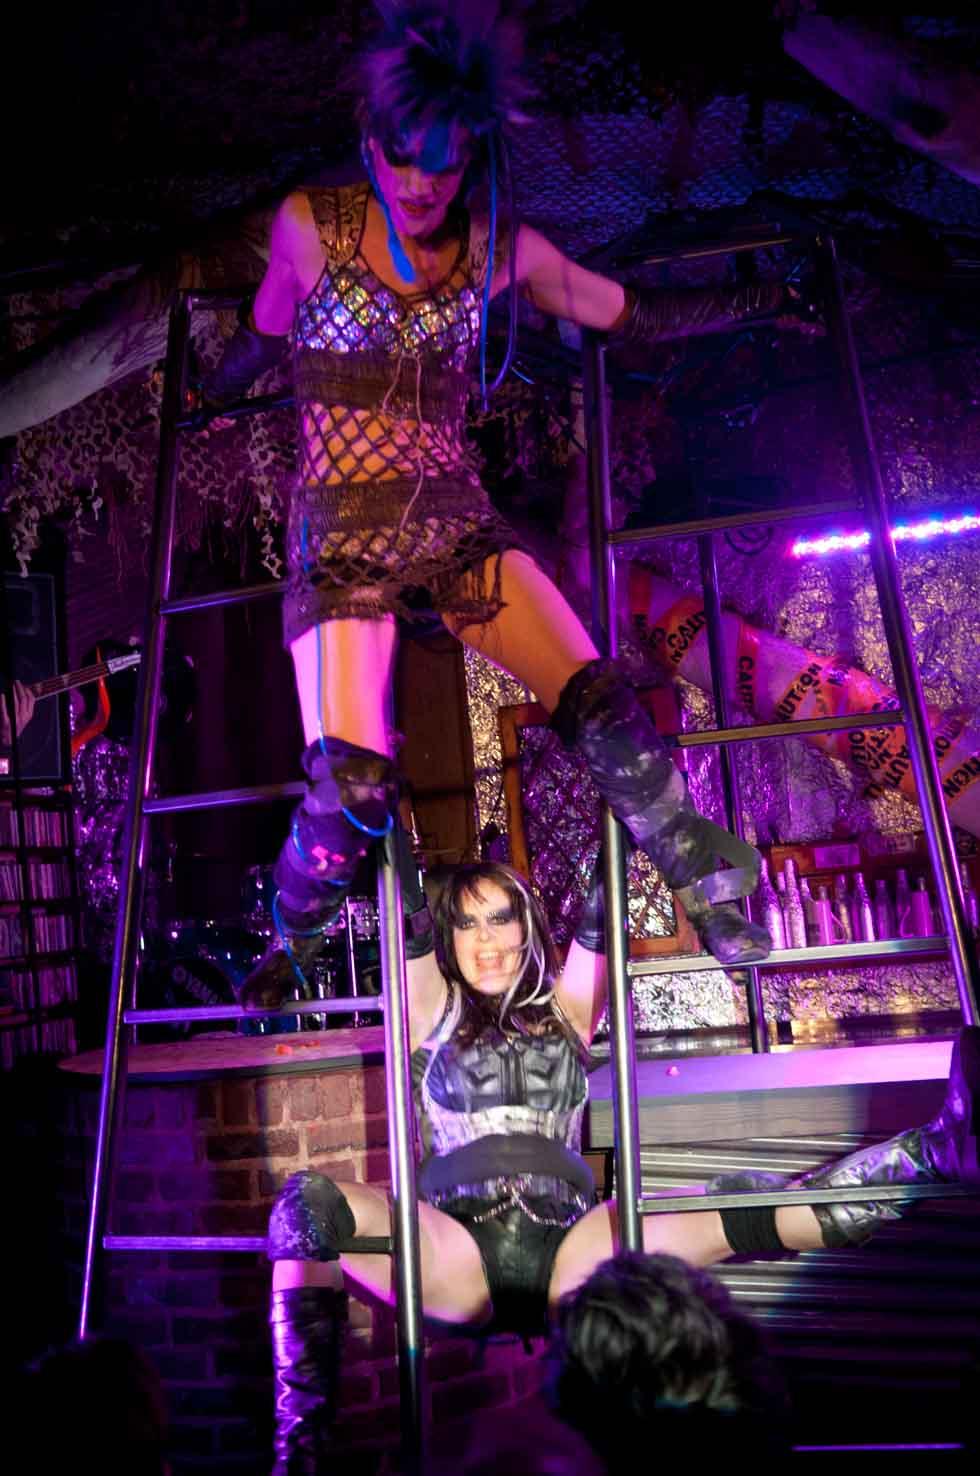 zum-schneider-nyc-2012-karneval-apocalyptika-4029.jpg